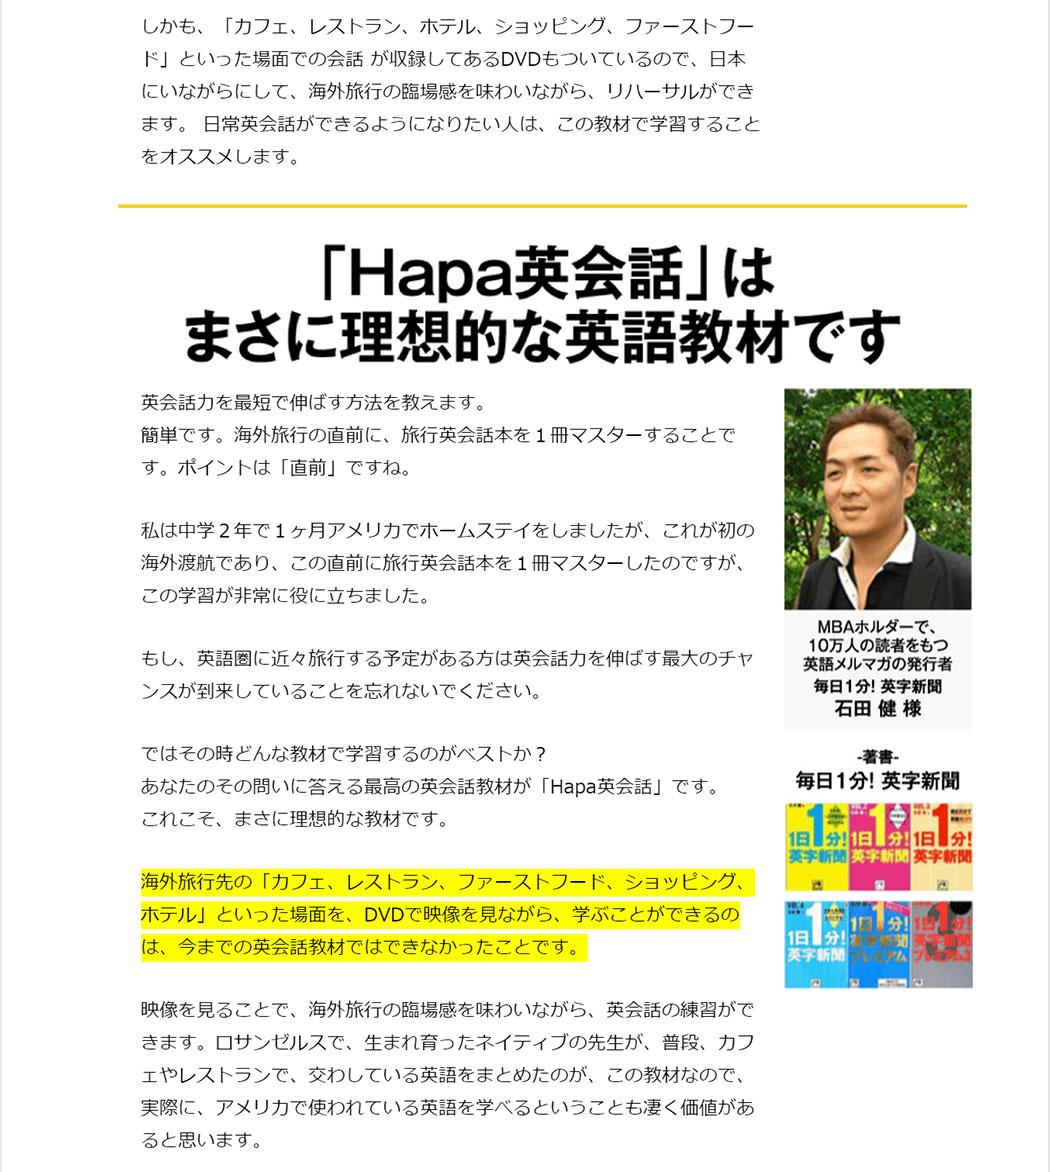 hapa-new-lp39.jpg